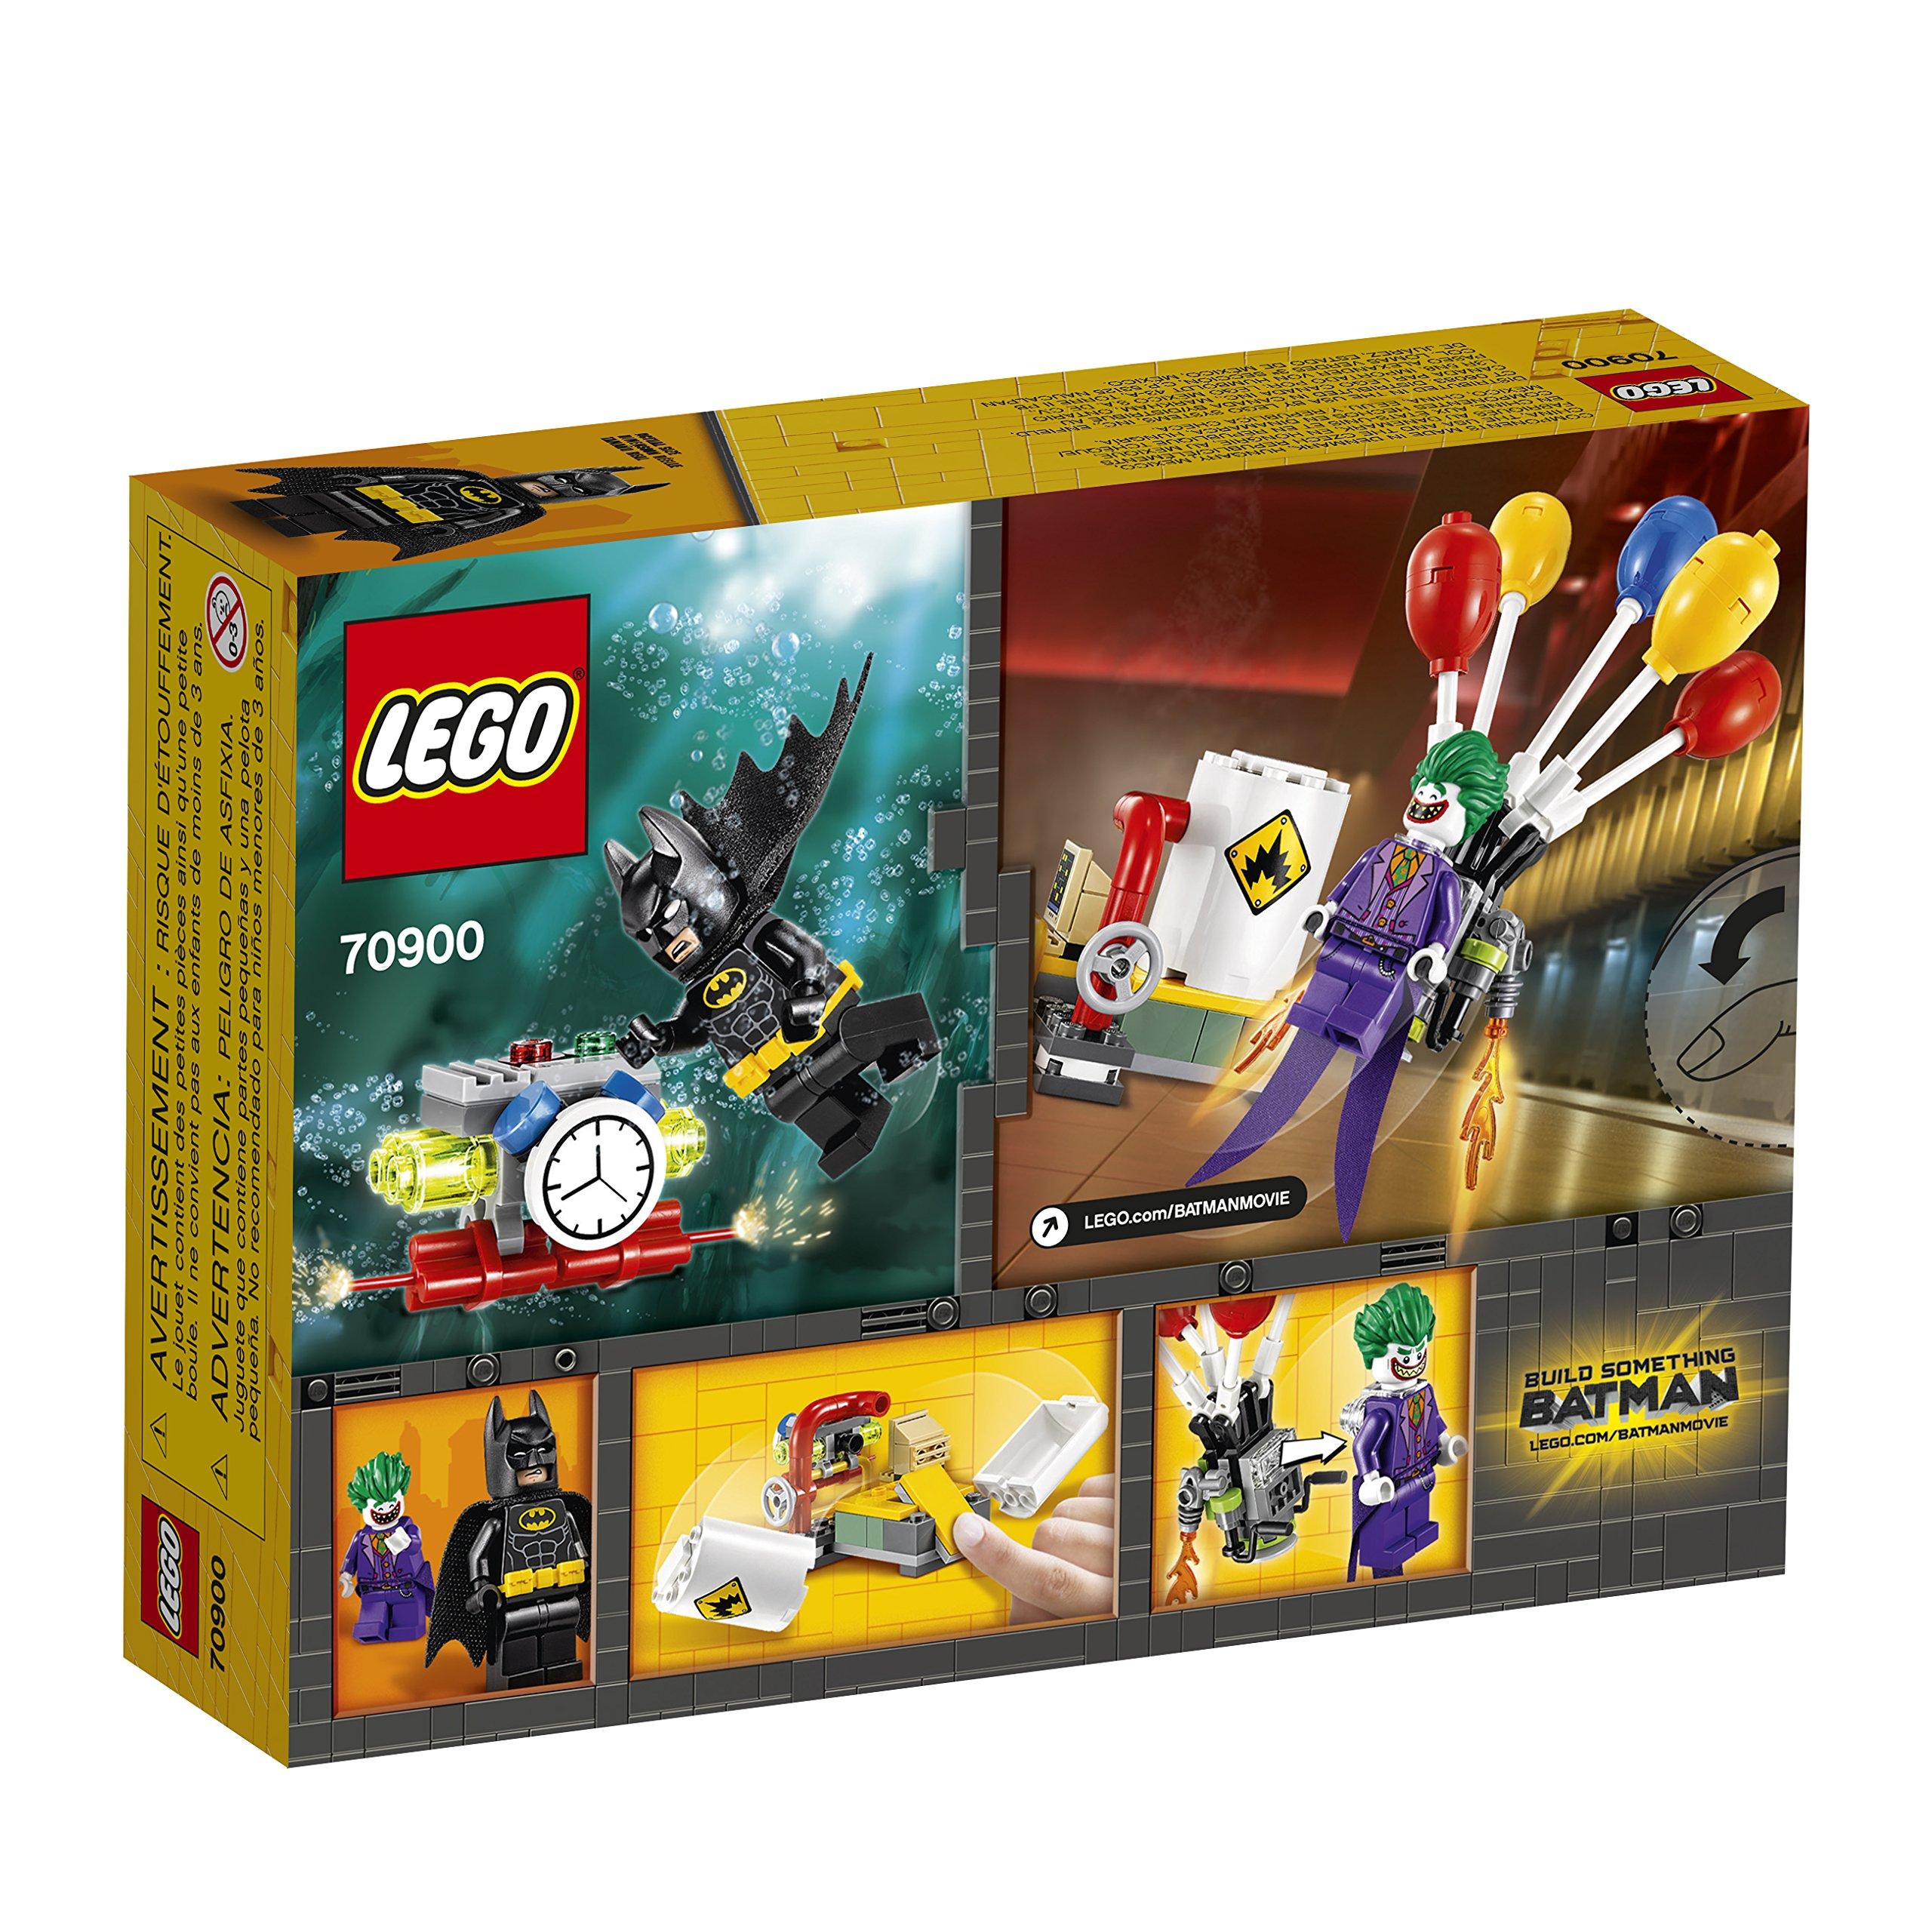 THE LEGO BATMAN MOVIE The Joker Balloon Escape 70900 Batman Toy